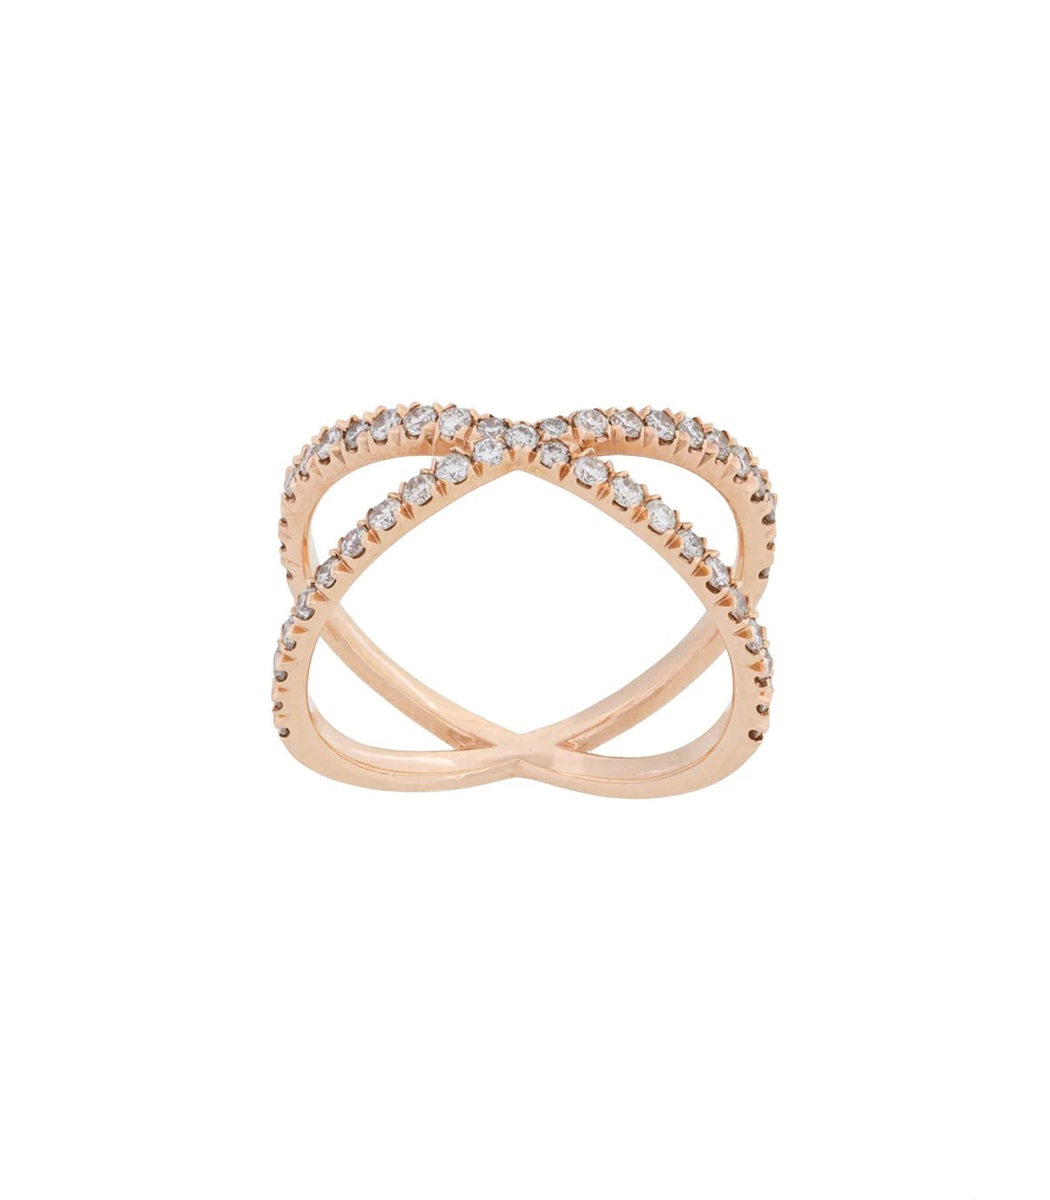 EVA FEHREN Gold Shorty Ring